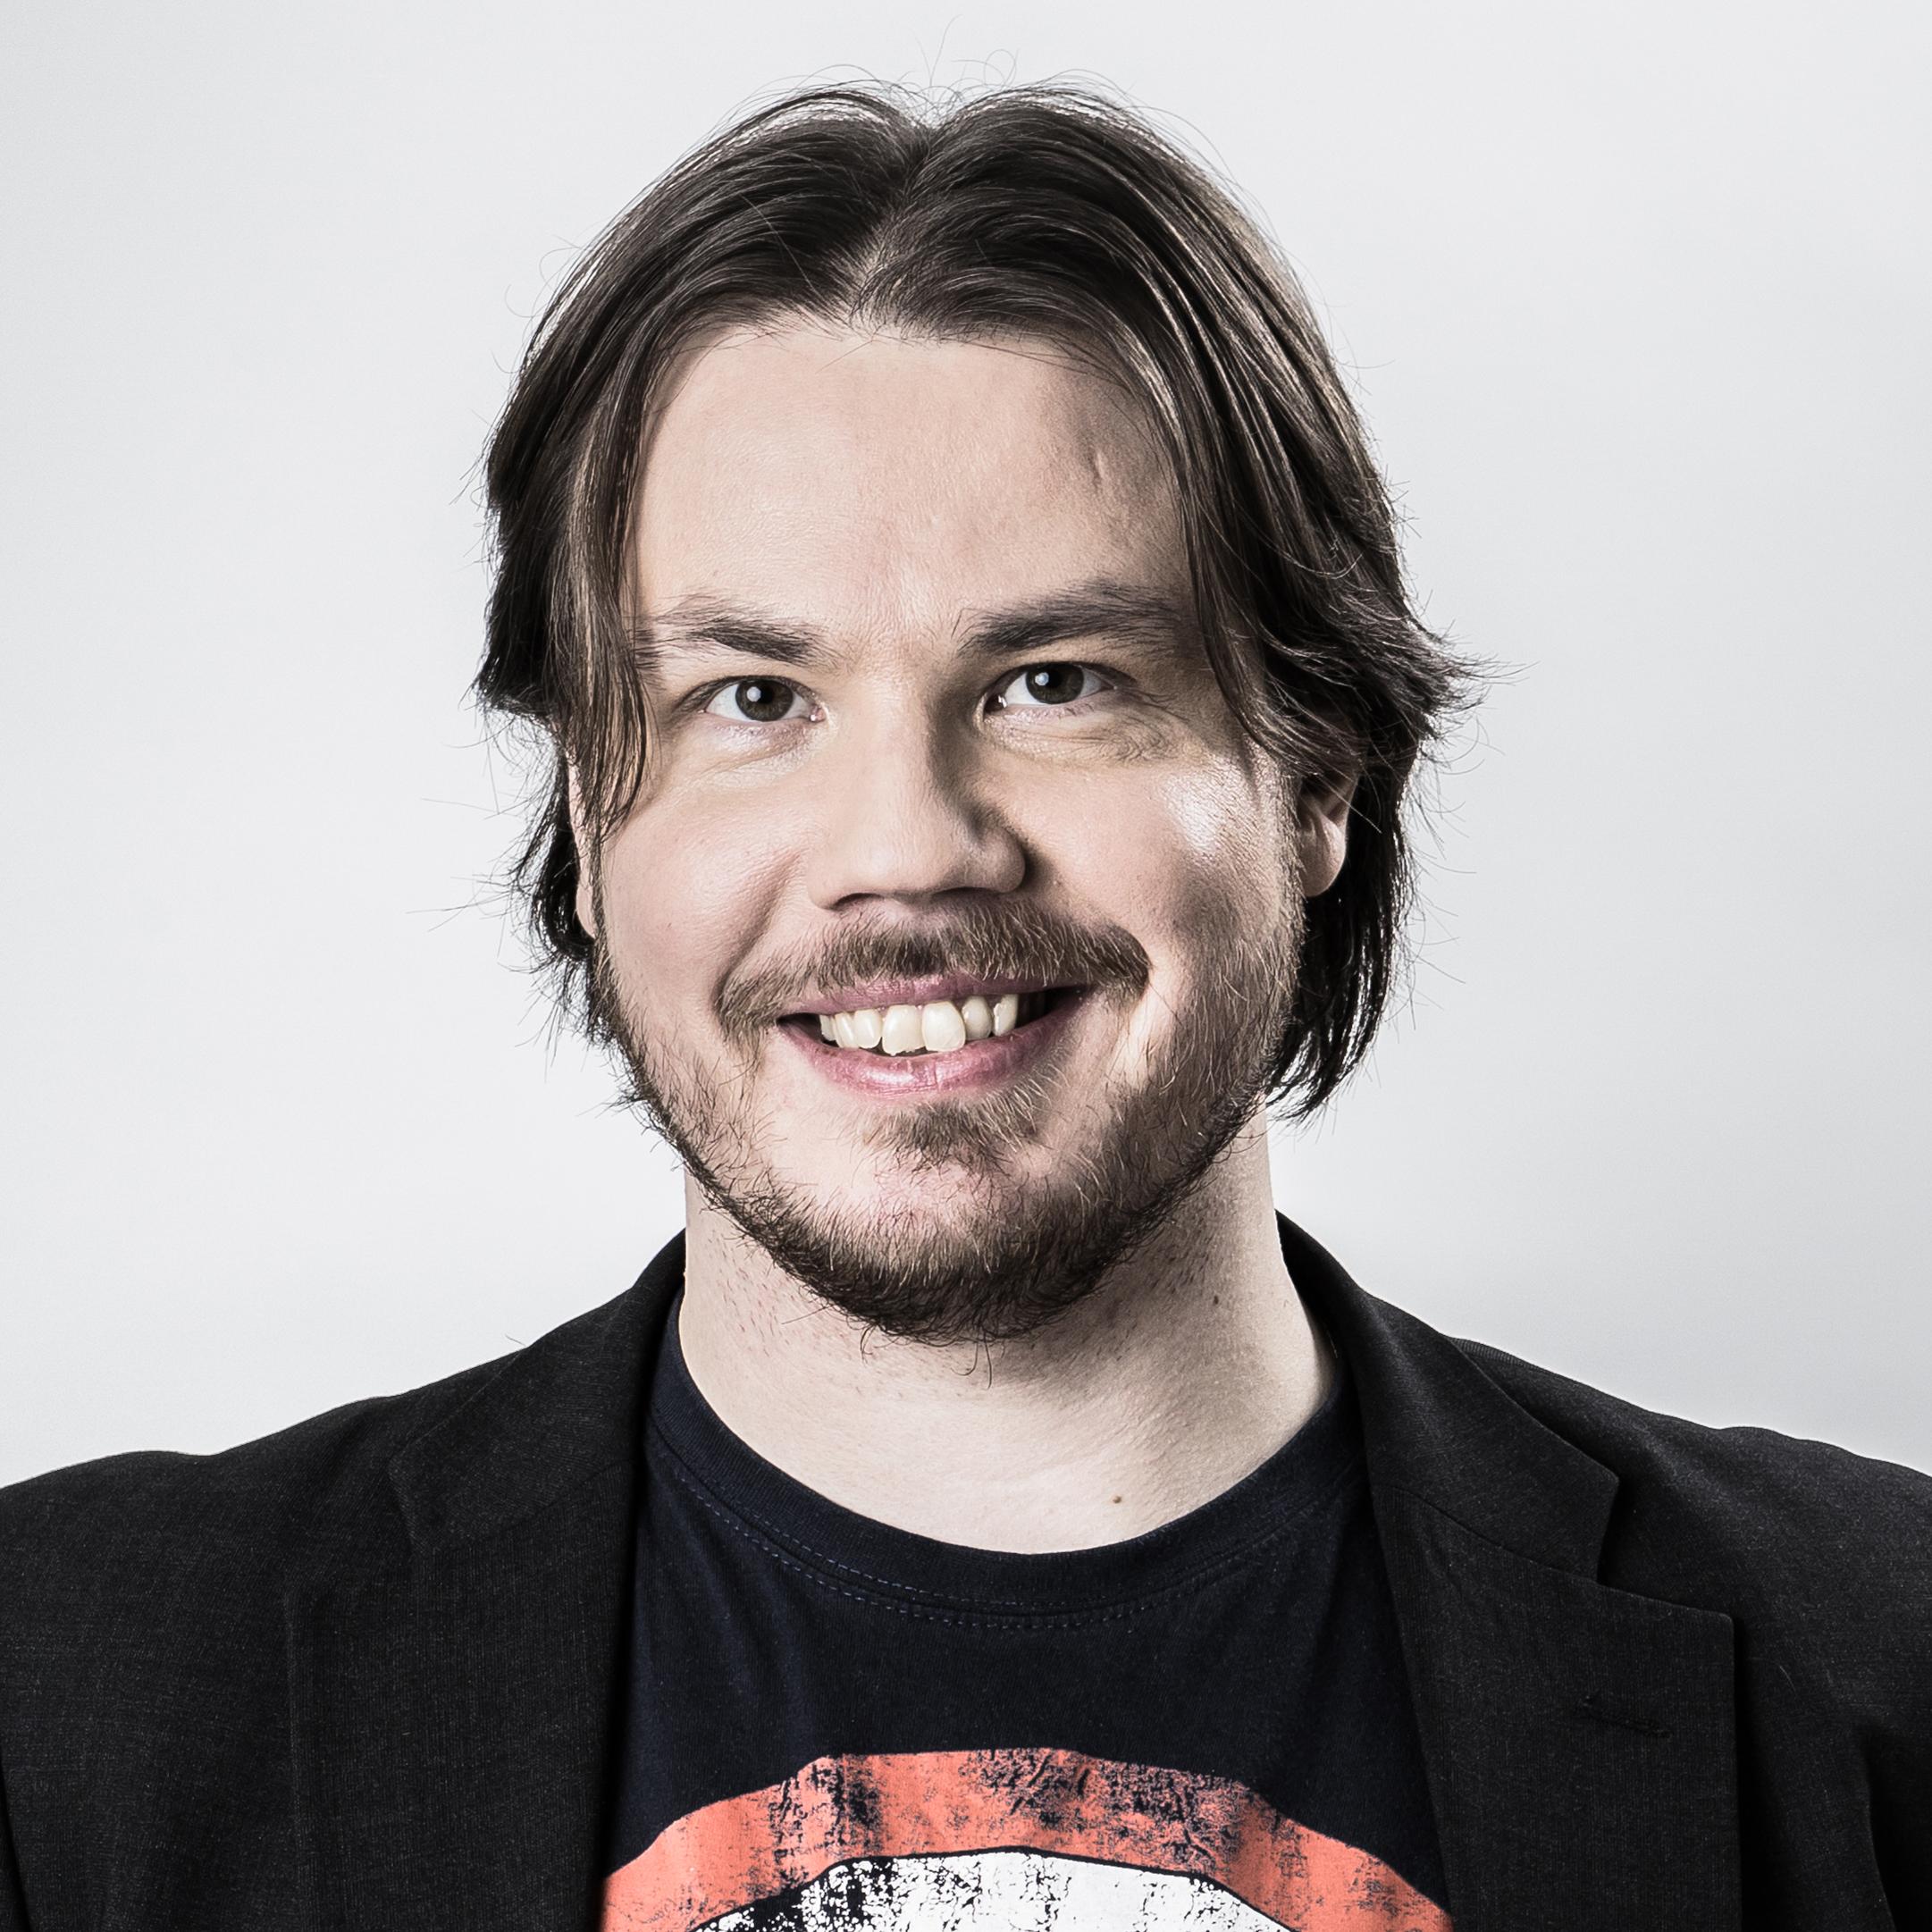 Lauri Photo Face